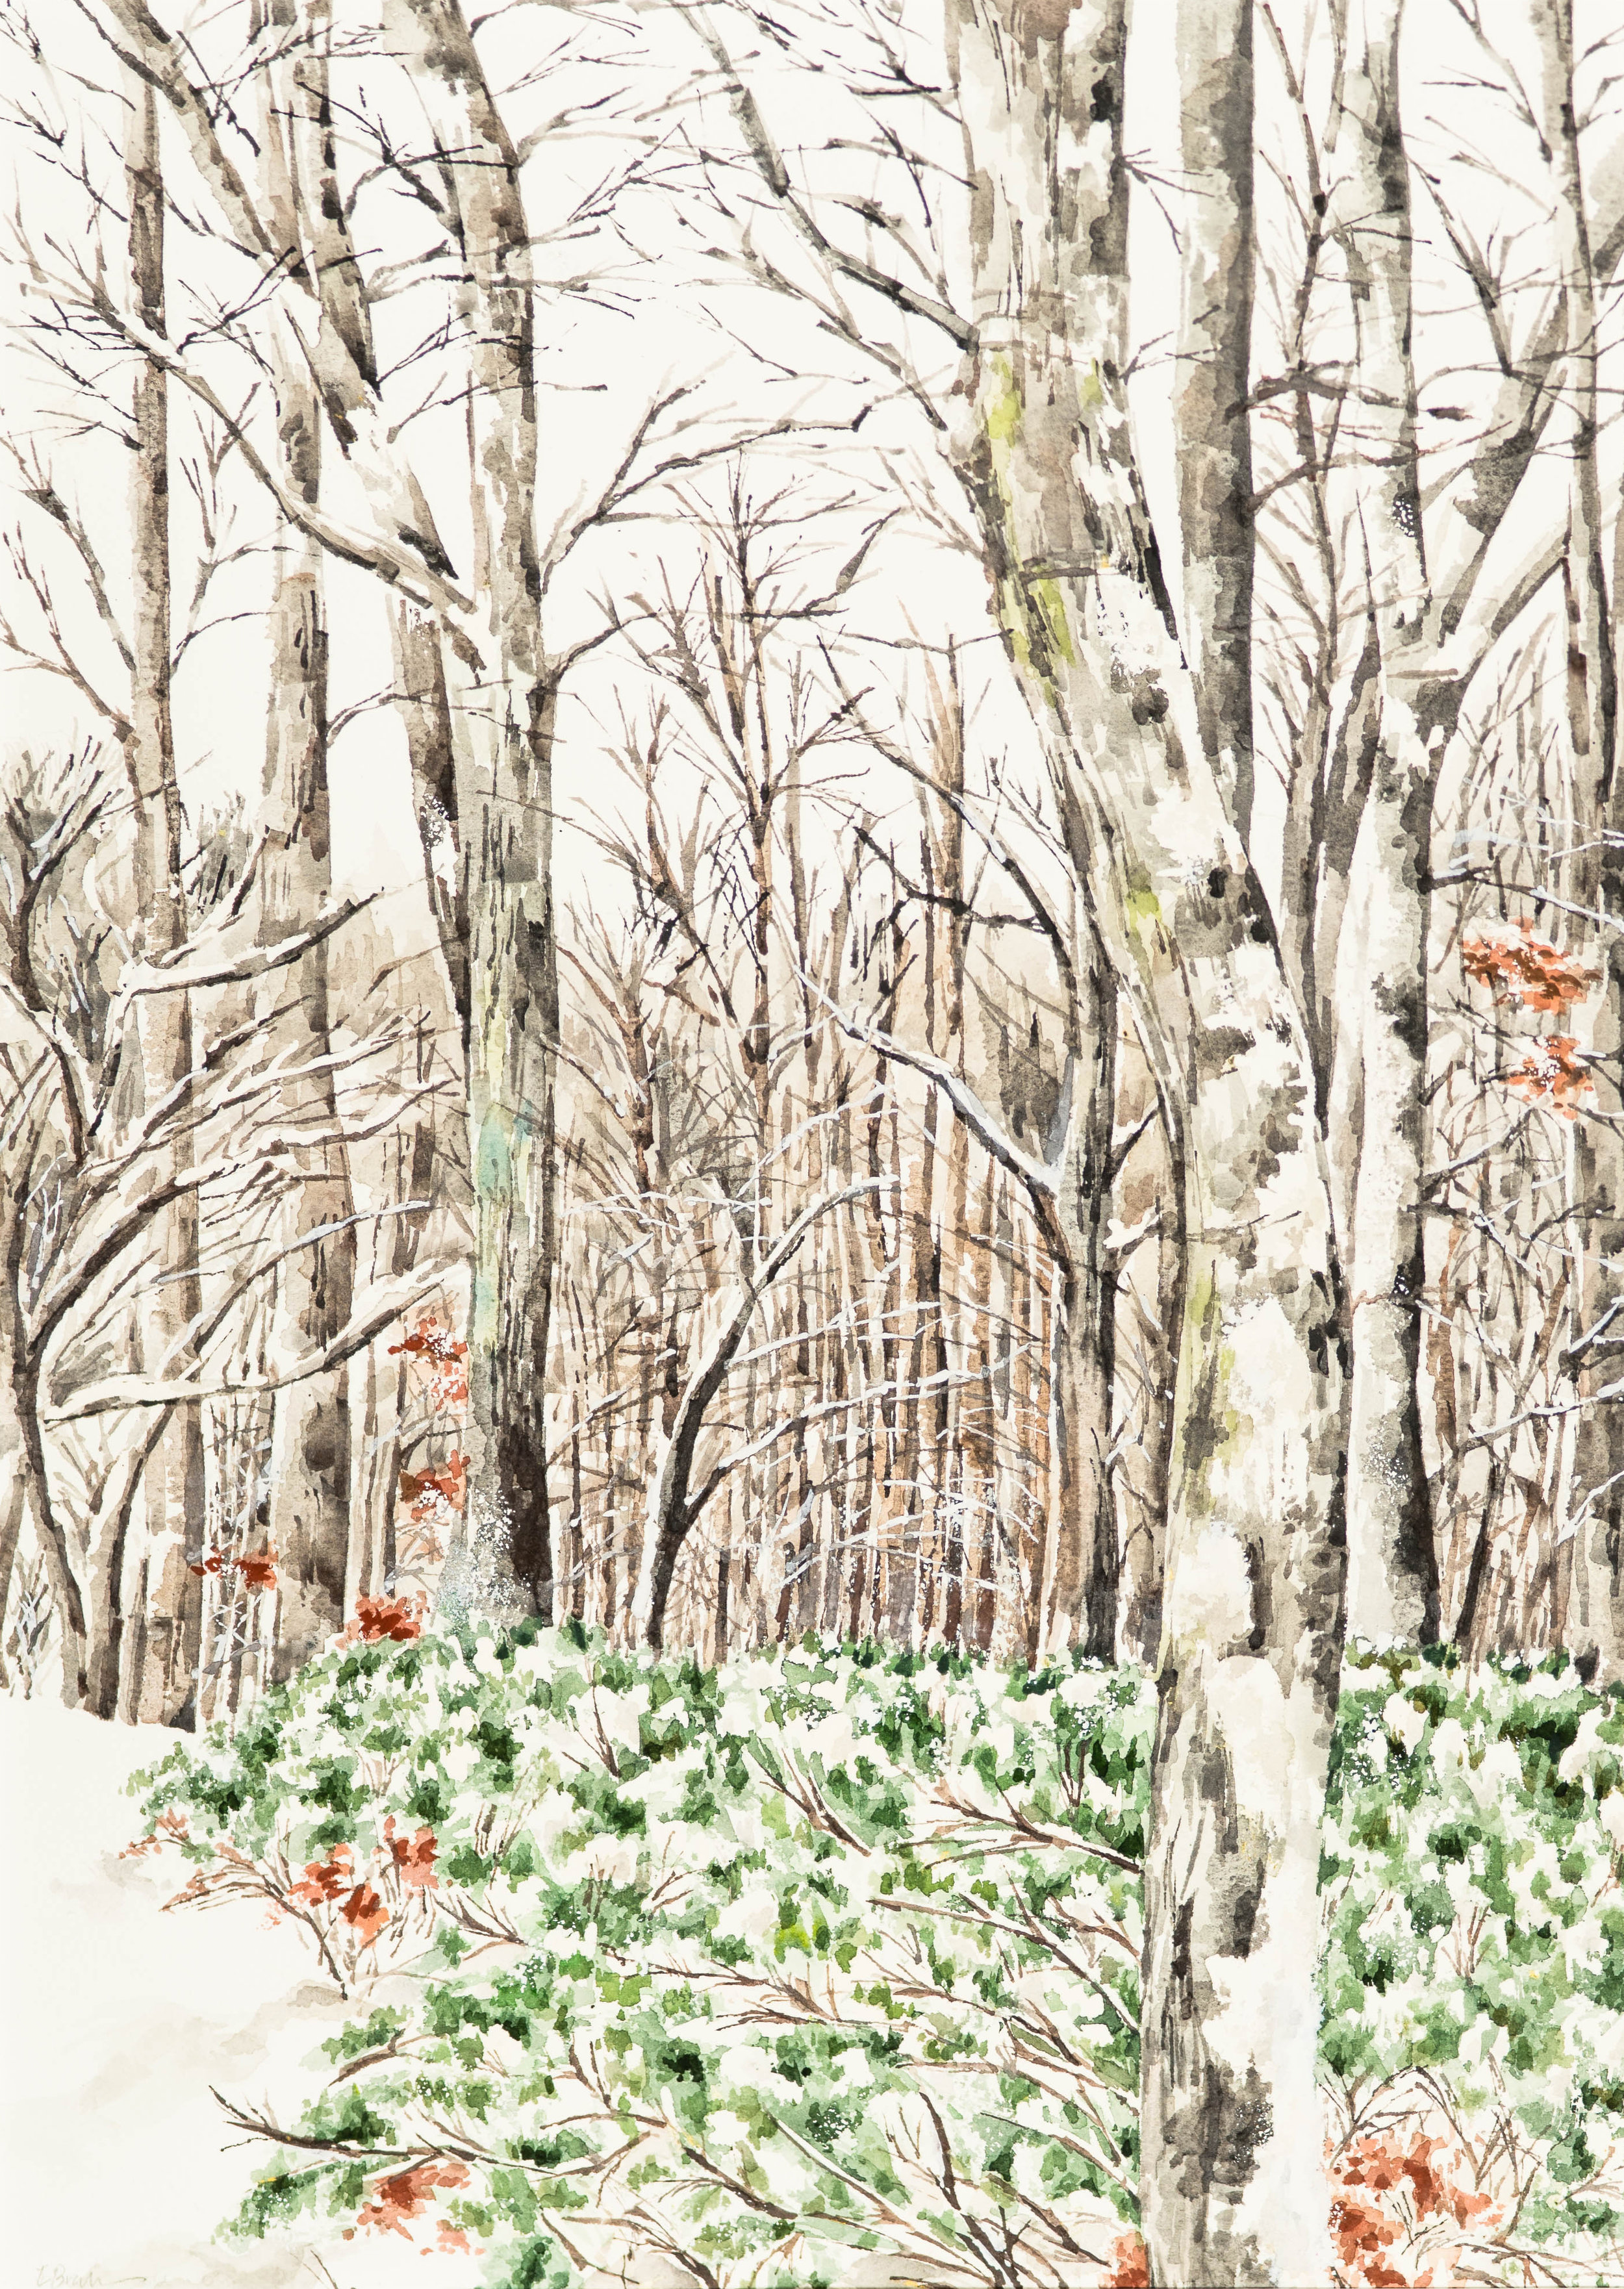 "Winter Trees 20 x 14.5"" Watercolor"